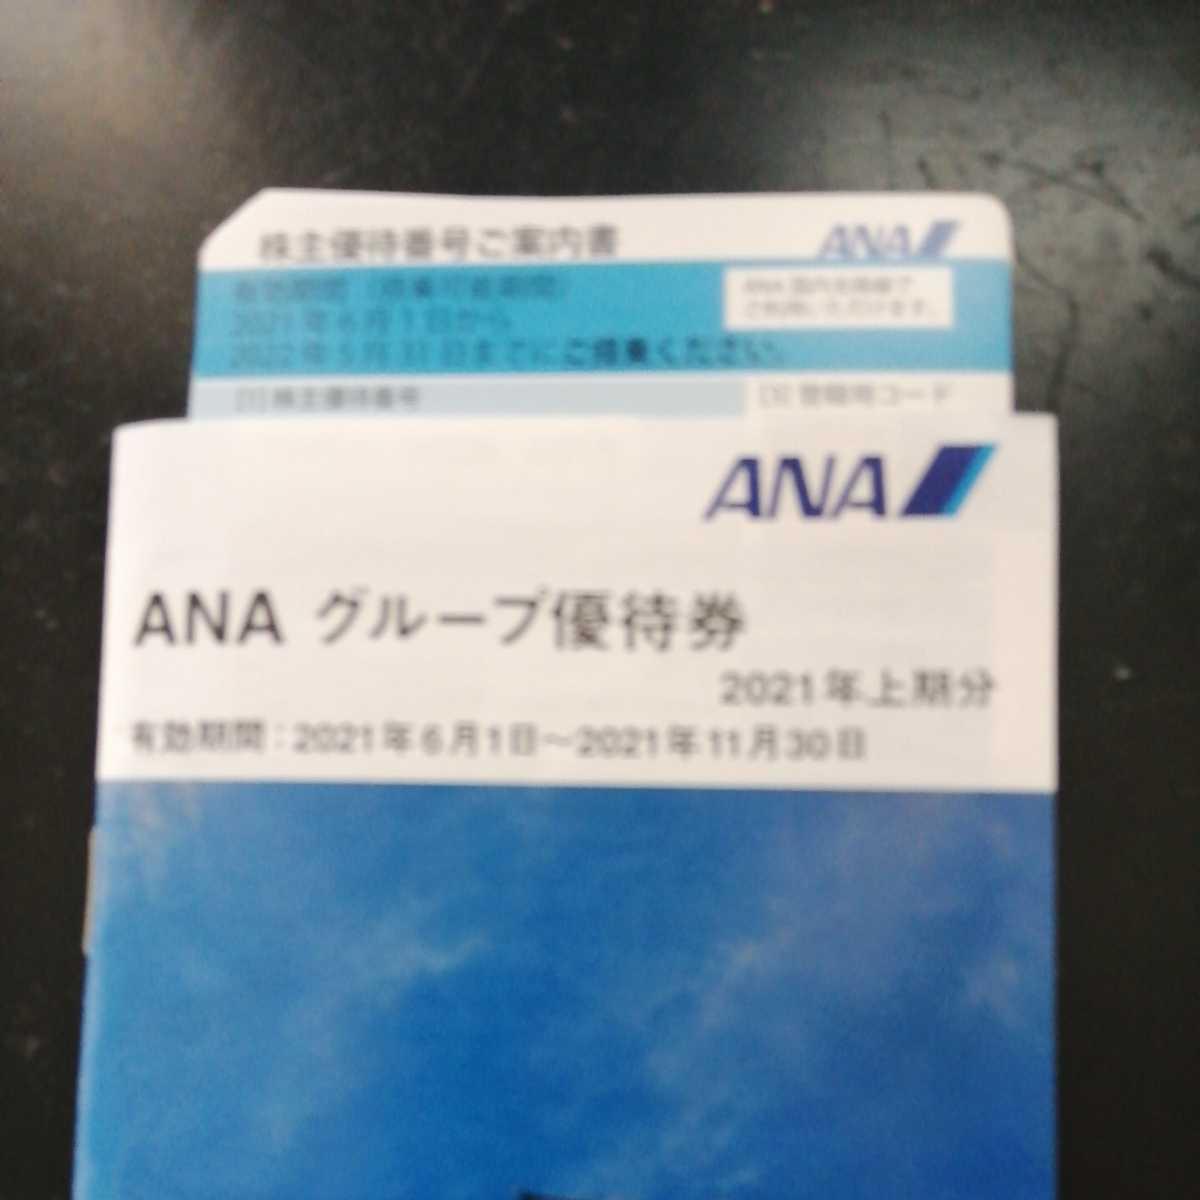 最新 株主優待 全日空 ANA  搭乗割引券 7枚 & グループ優待券_画像1